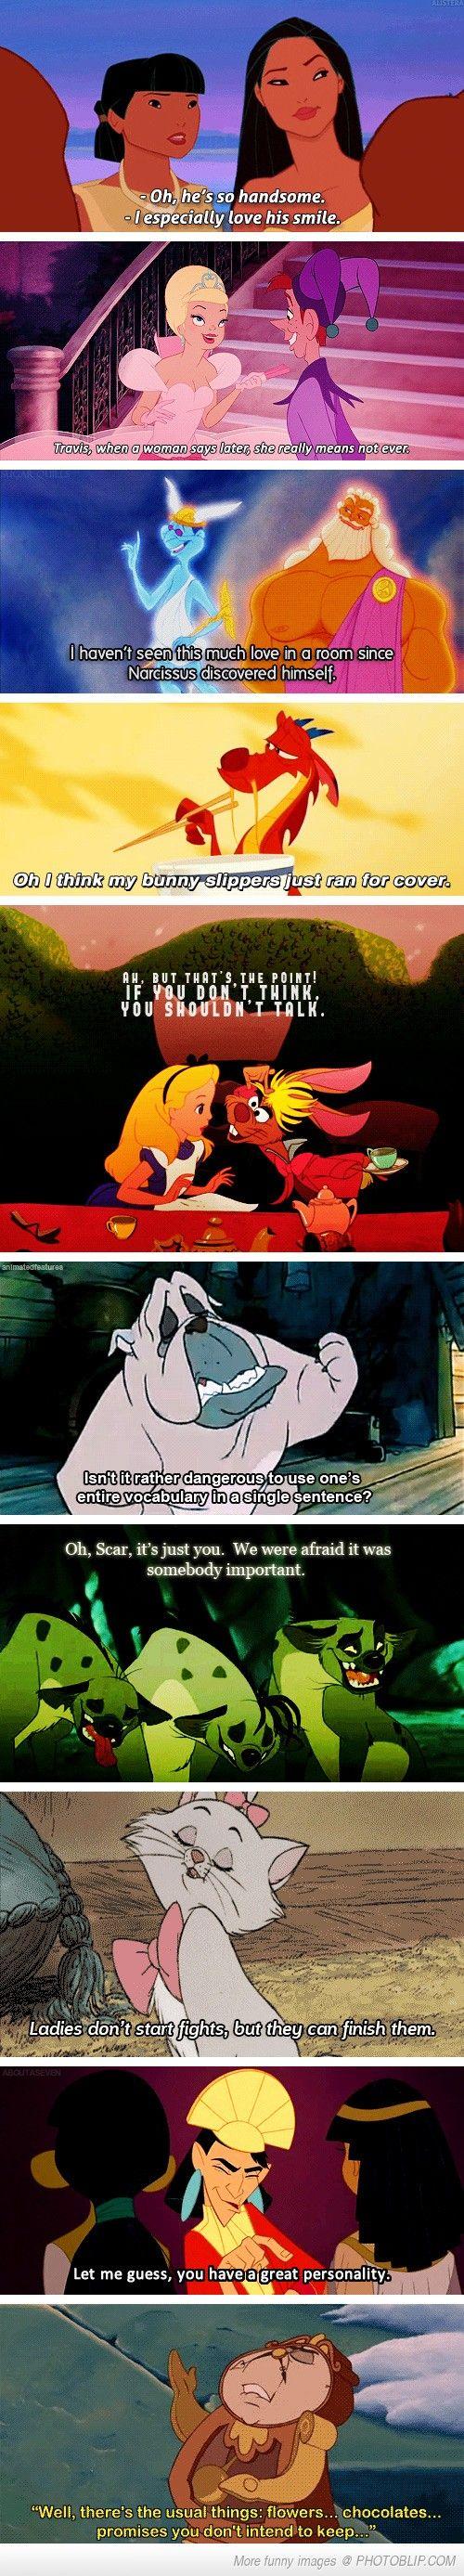 Disney Keeps it real.